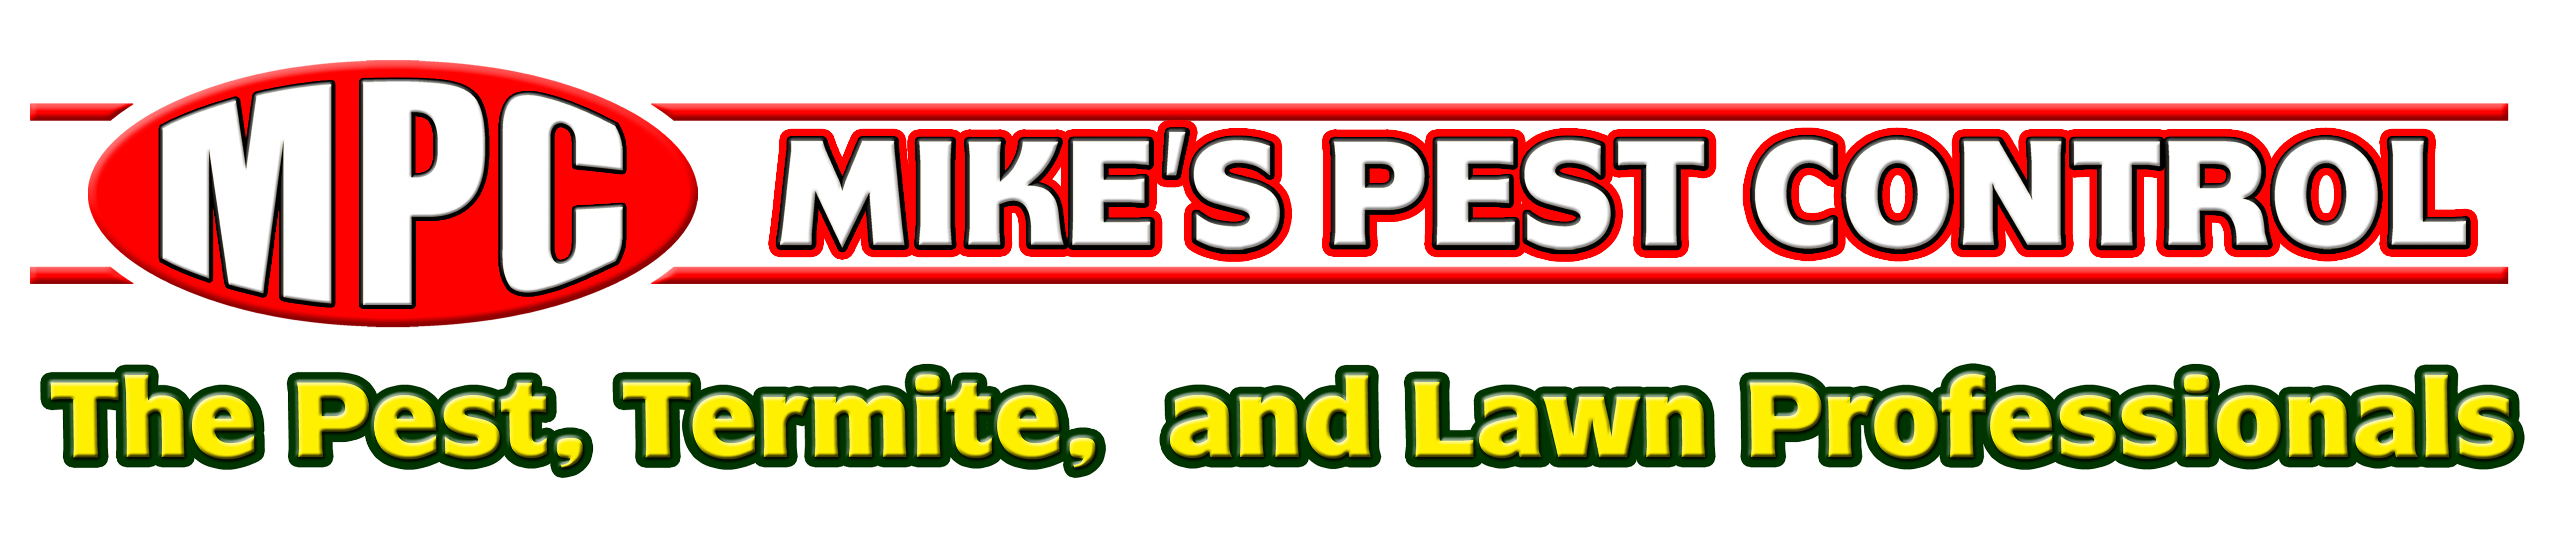 Mike's Pest Control McAlester, Eufaula, Atoka logo